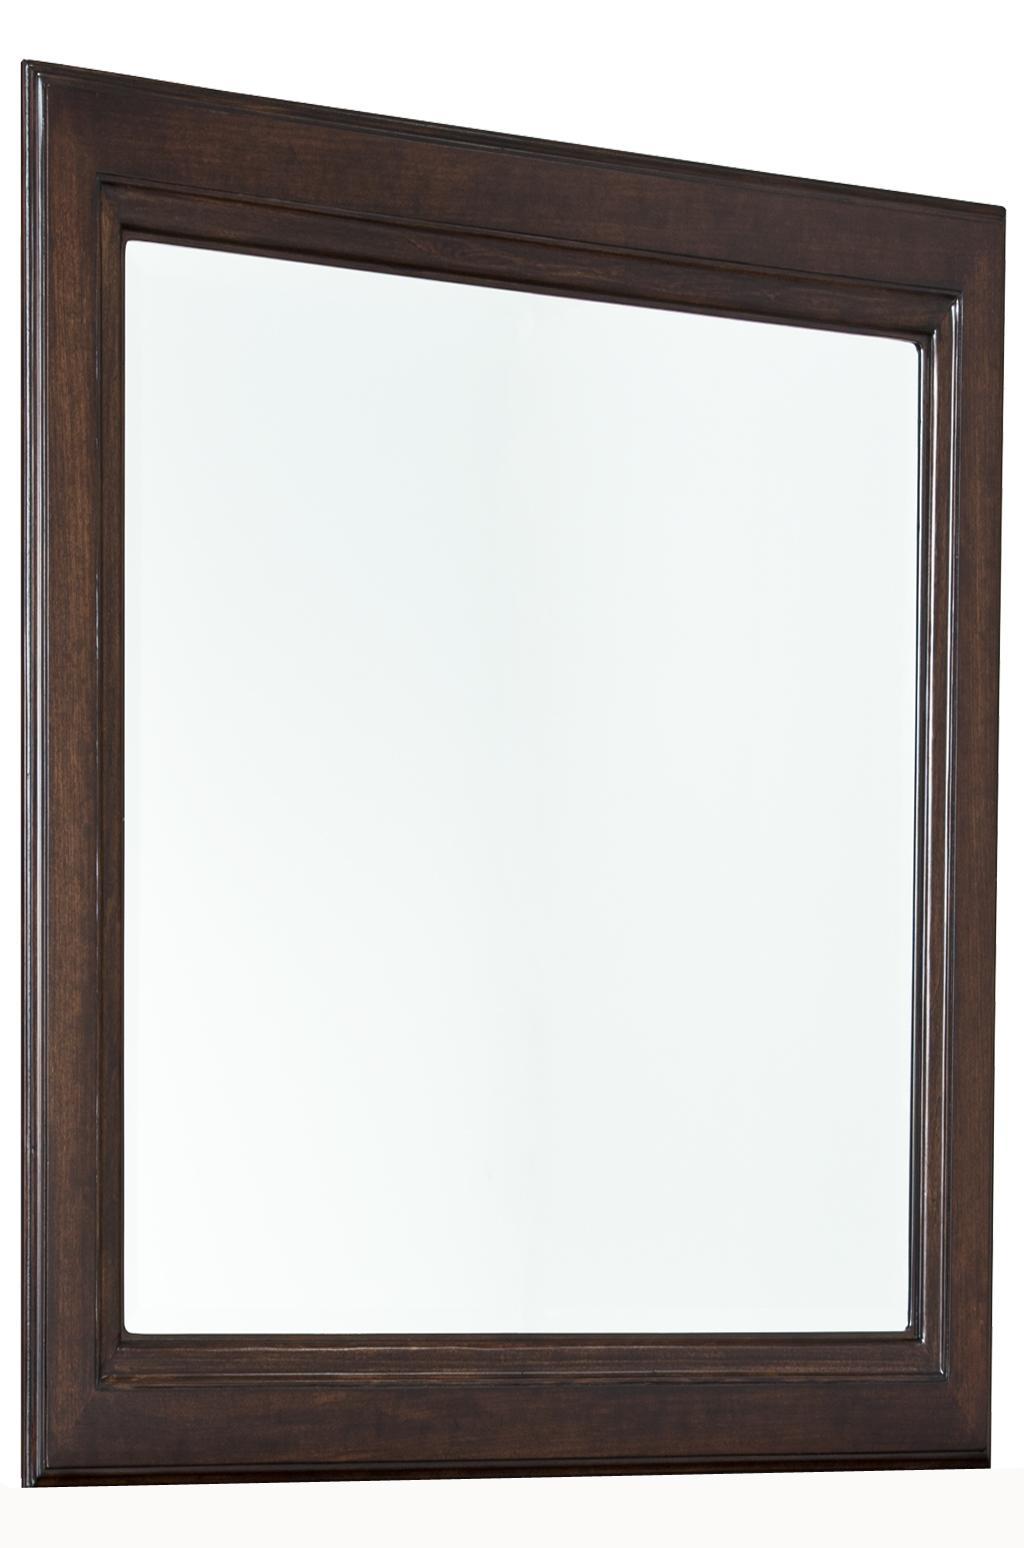 Benchmark Dresser Mirror by Legacy Classic Kids at HomeWorld Furniture